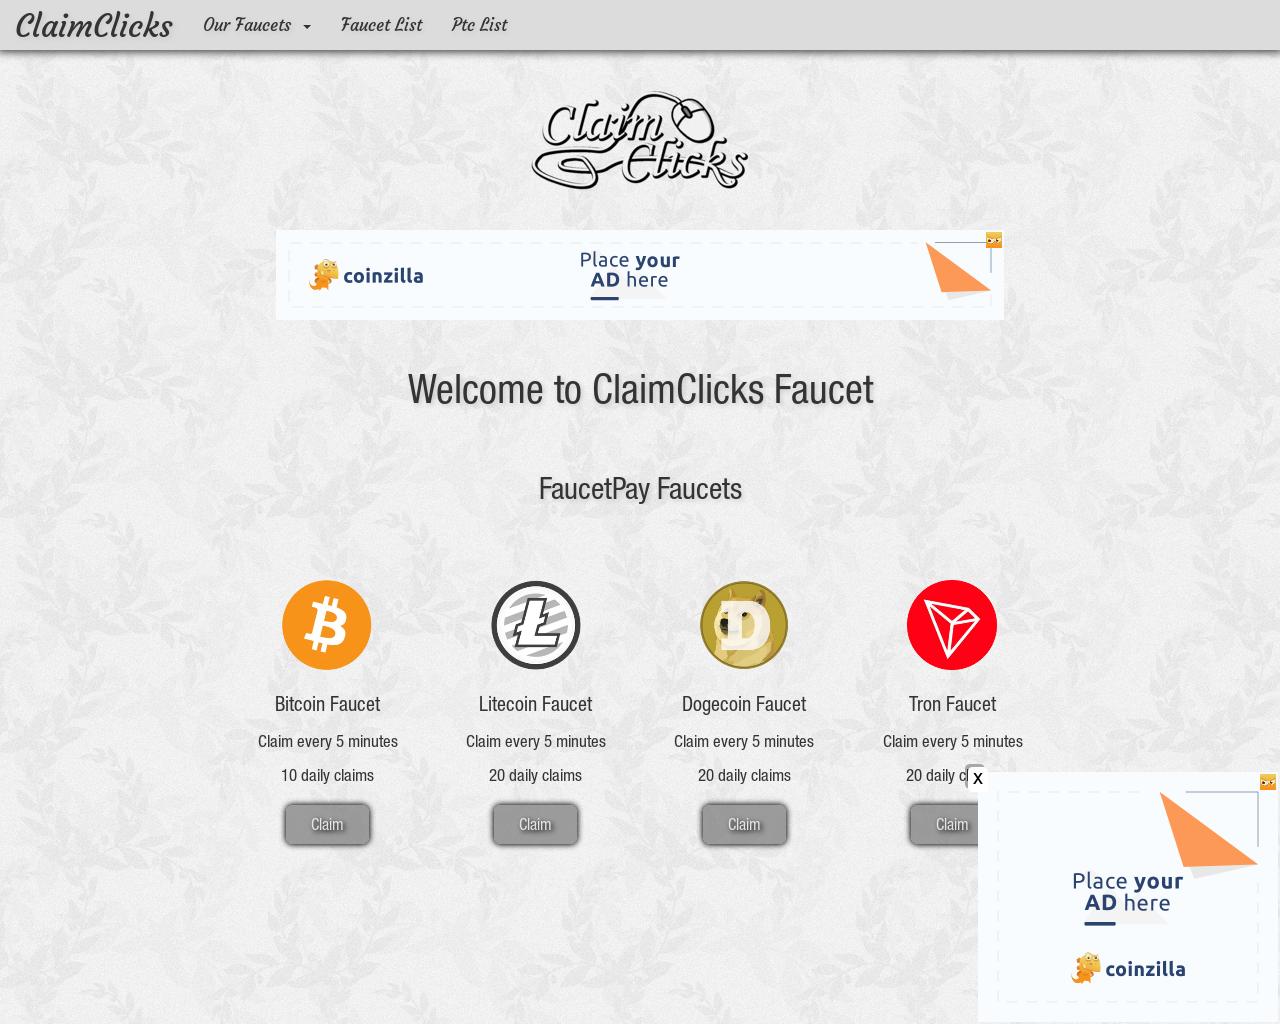 Claimclicks